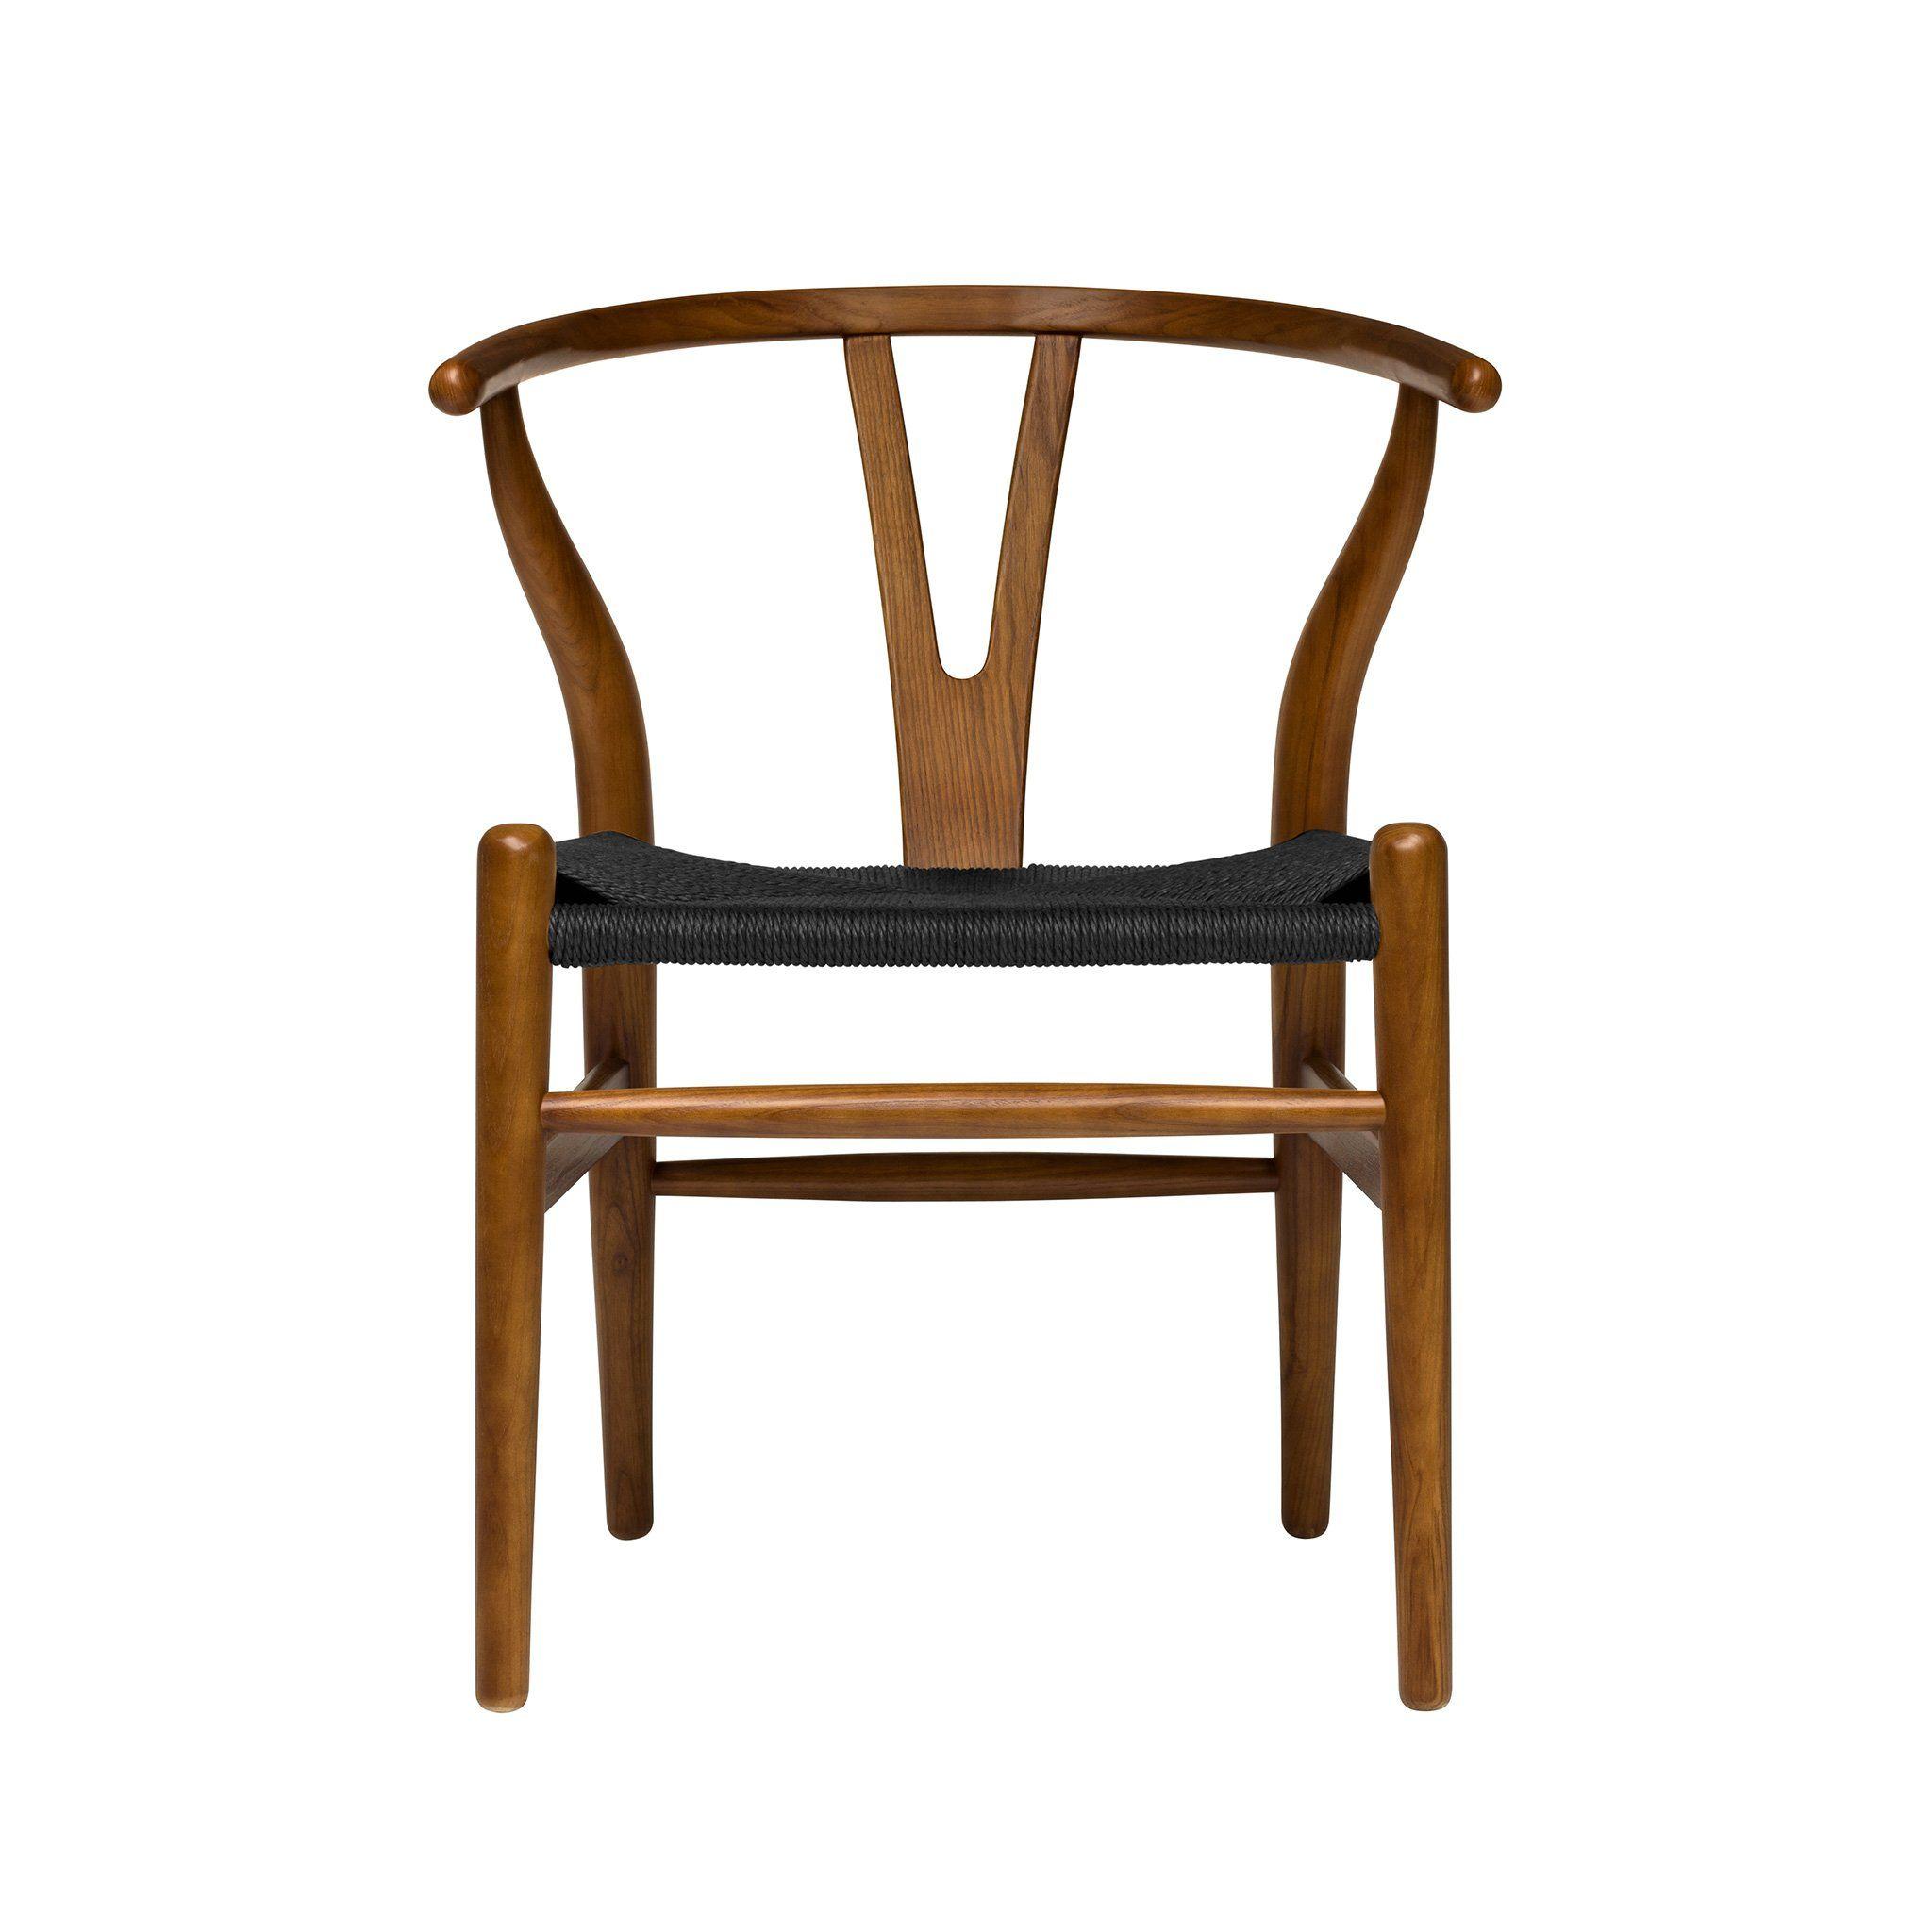 Wishbone Chair (Walnut/Black Woven Cord) Wishbone chair